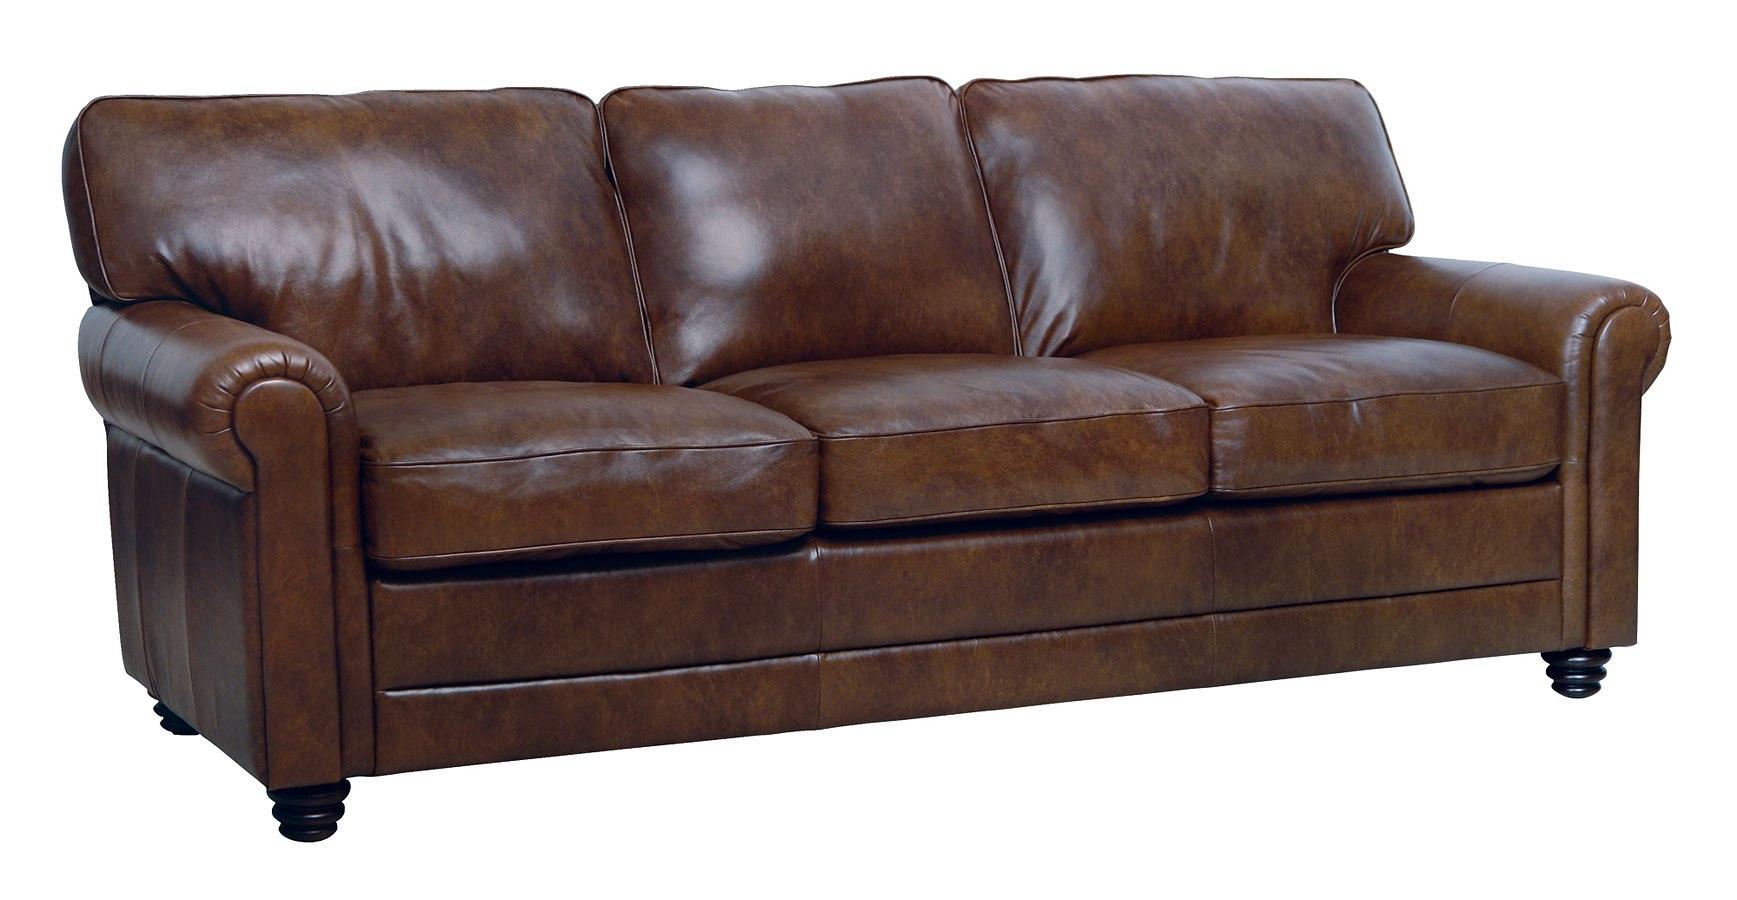 Andrew Italian Leather Sofa by Luke Leather | FurniturePick